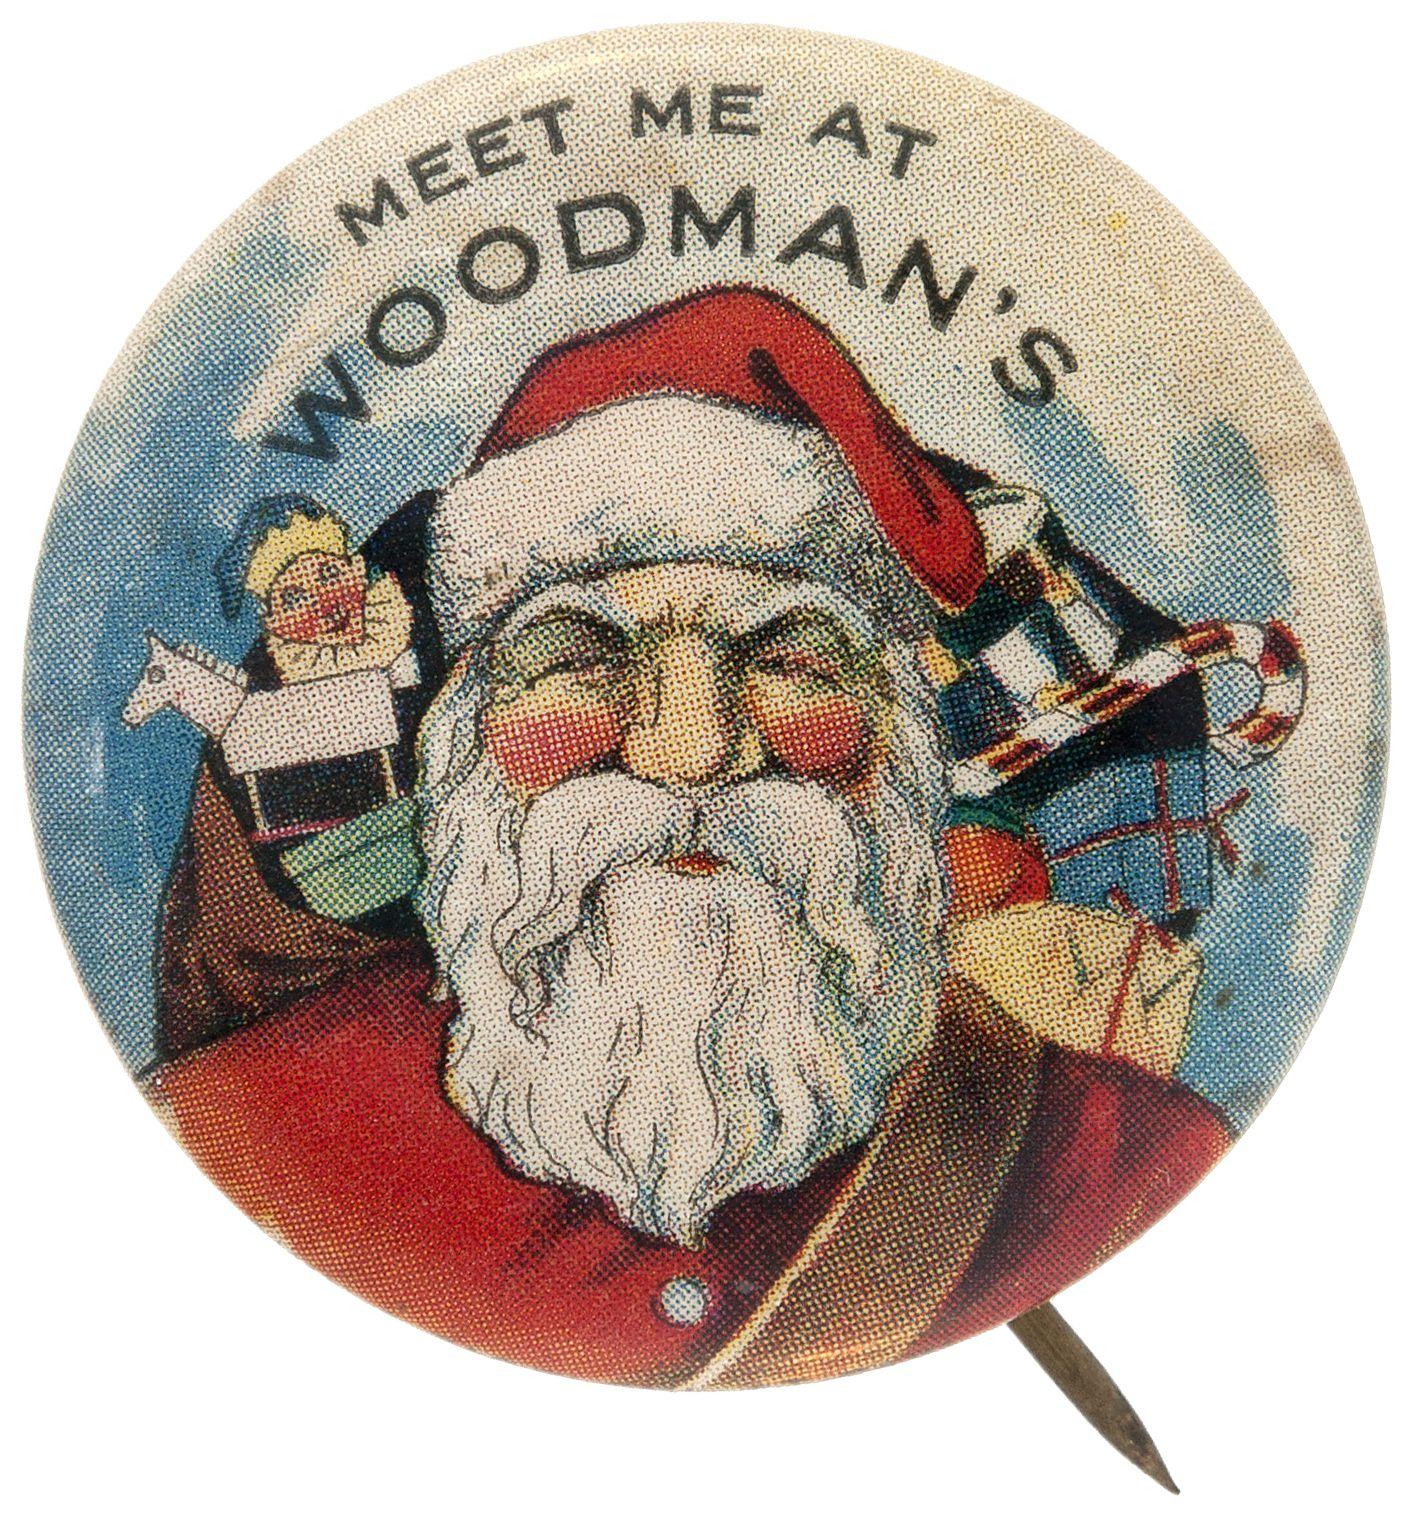 Knöpfe Weihnachtsmotive.Pin By Jim Lassiter On Santa Pinbacks Vintage Christmas Christmas